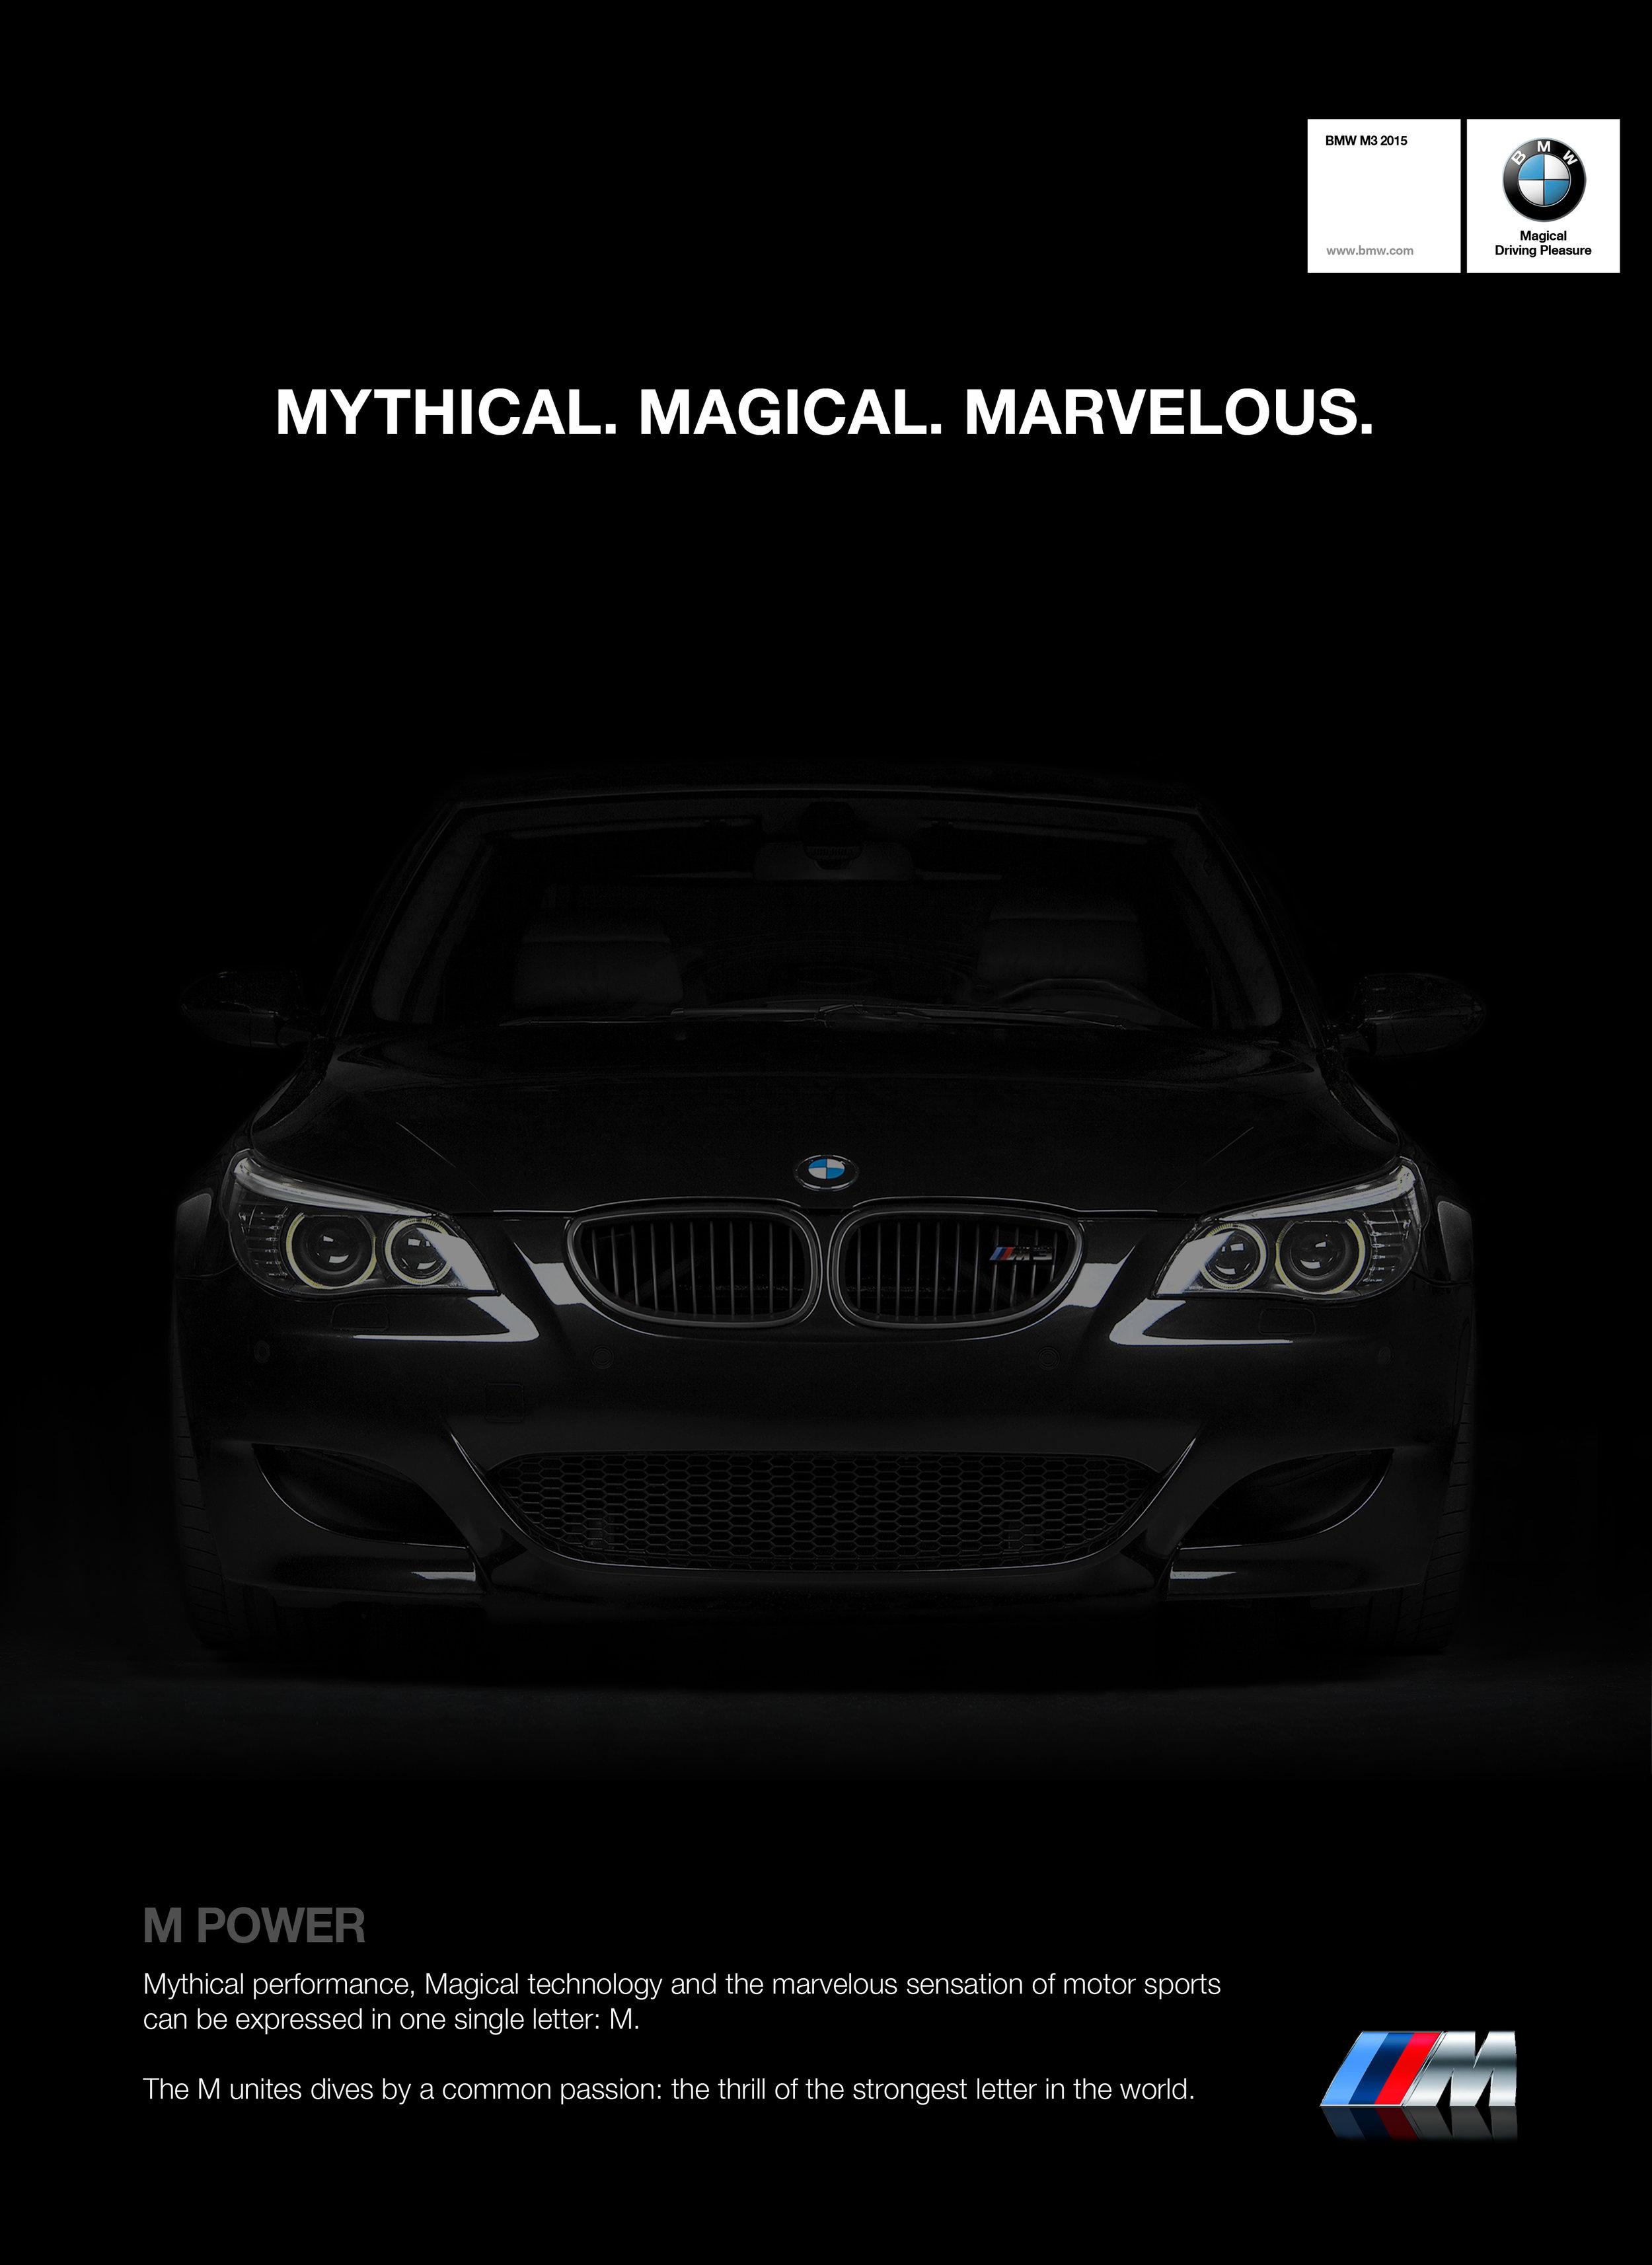 Kyle Puma-BMW-Mseries-M3-3 words.jpg